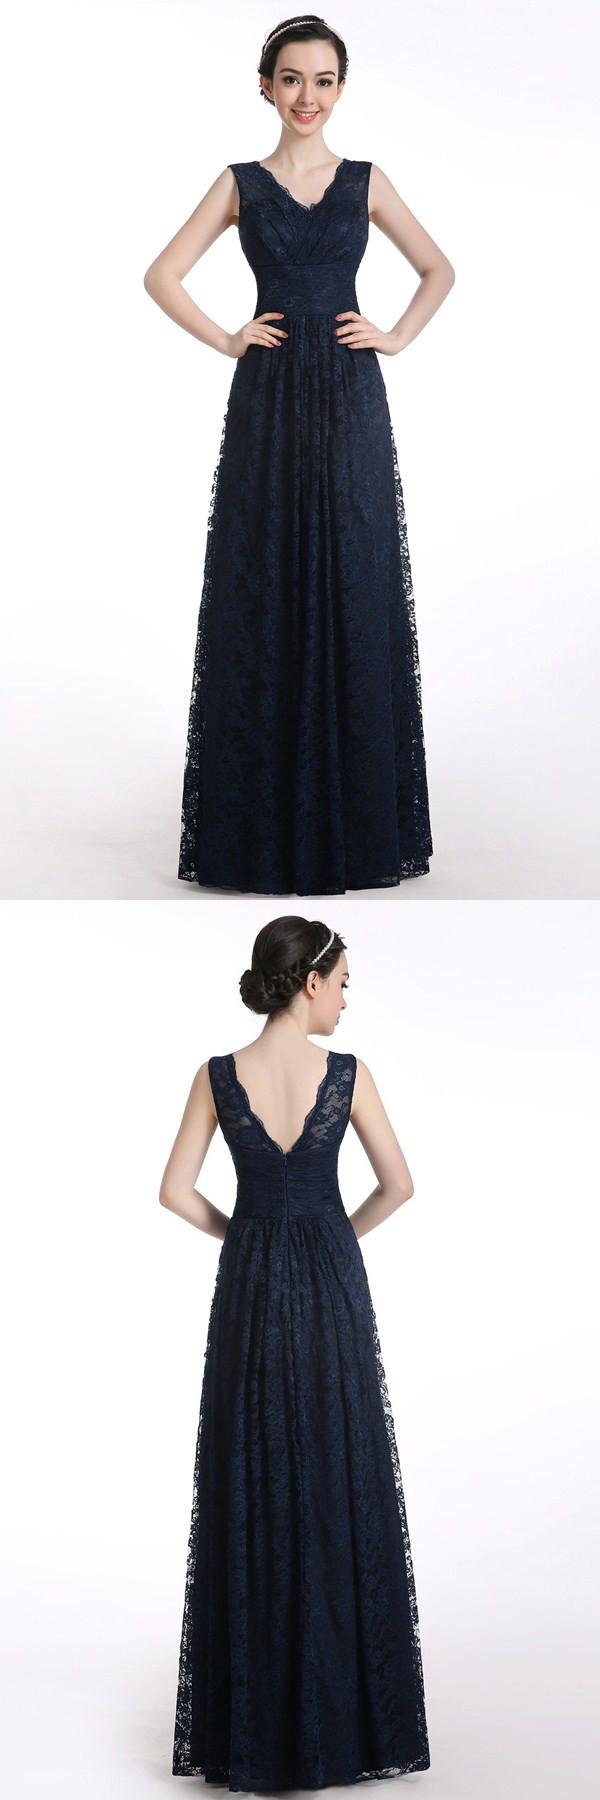 Aline vneck floorlength sleeveless lace navy blue long pron dress